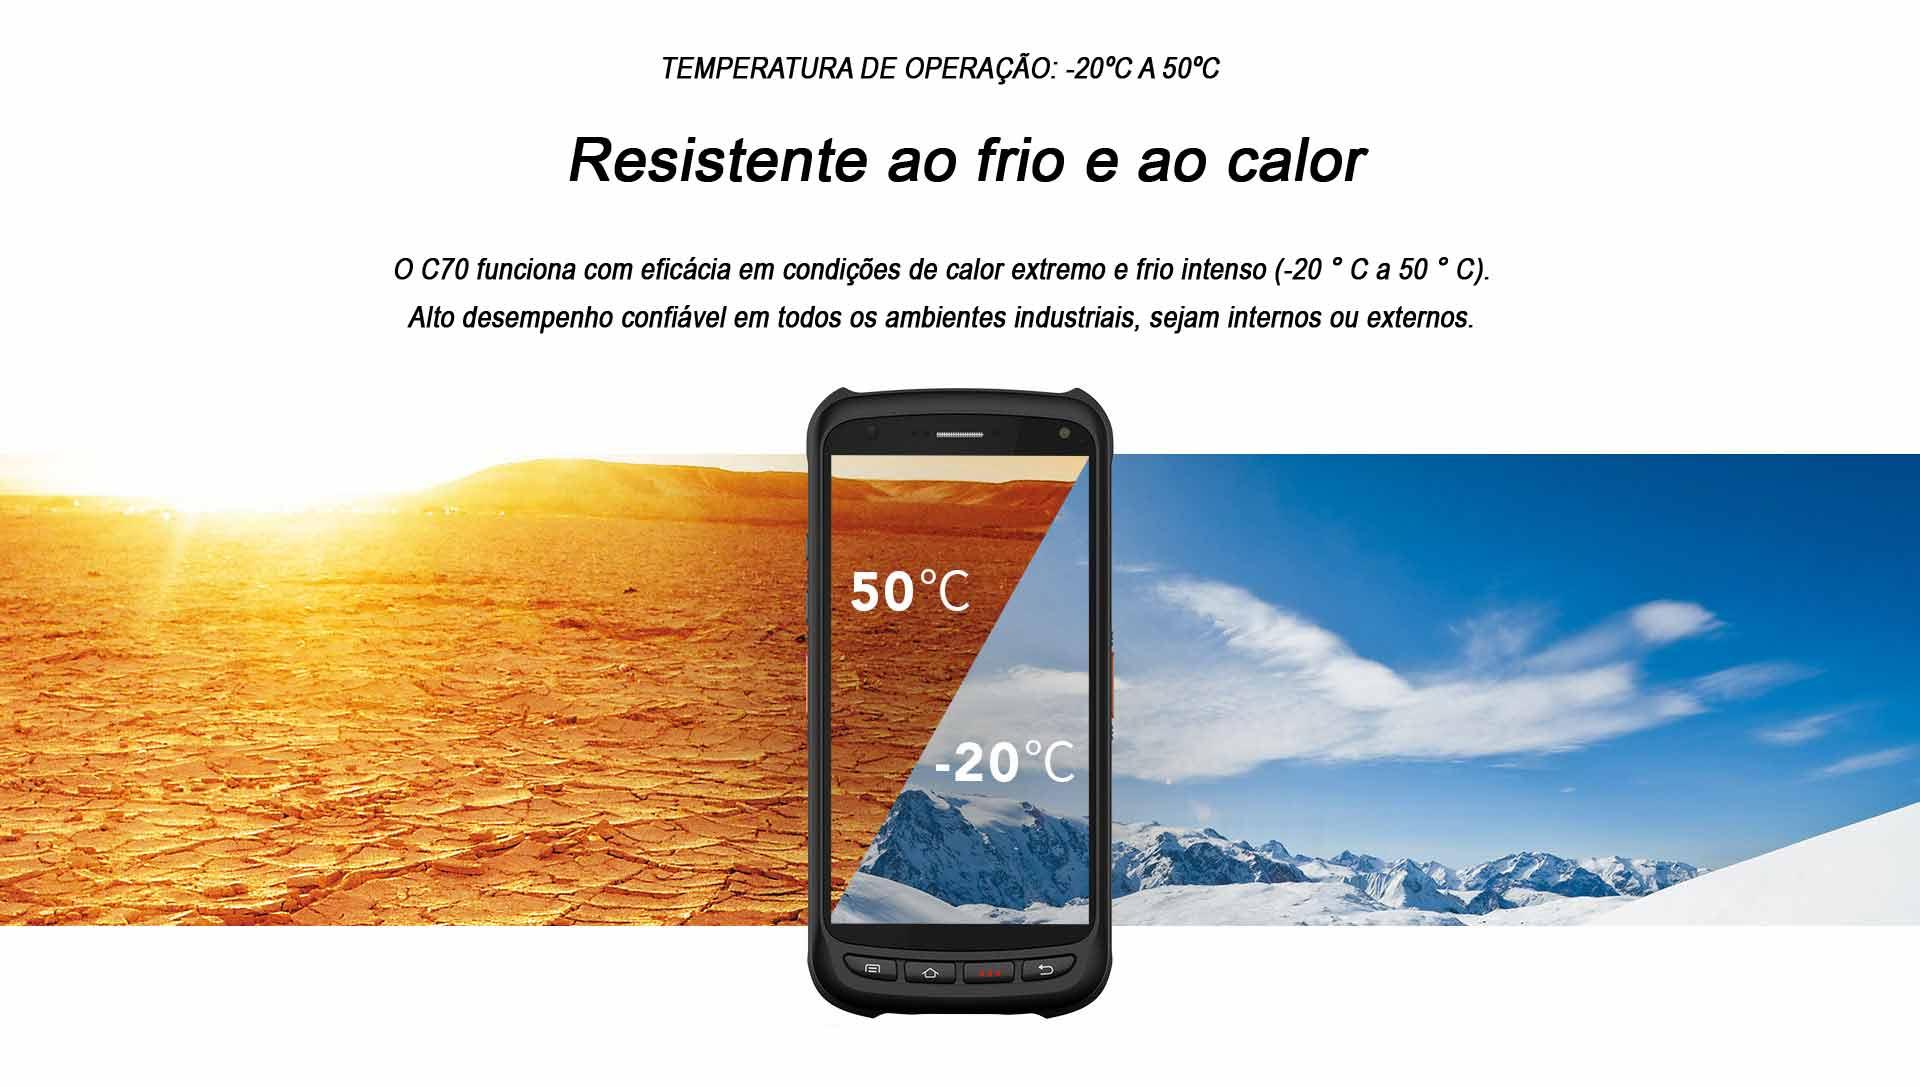 Terminal Móvel C70 Chainway Android Resistente frio calor